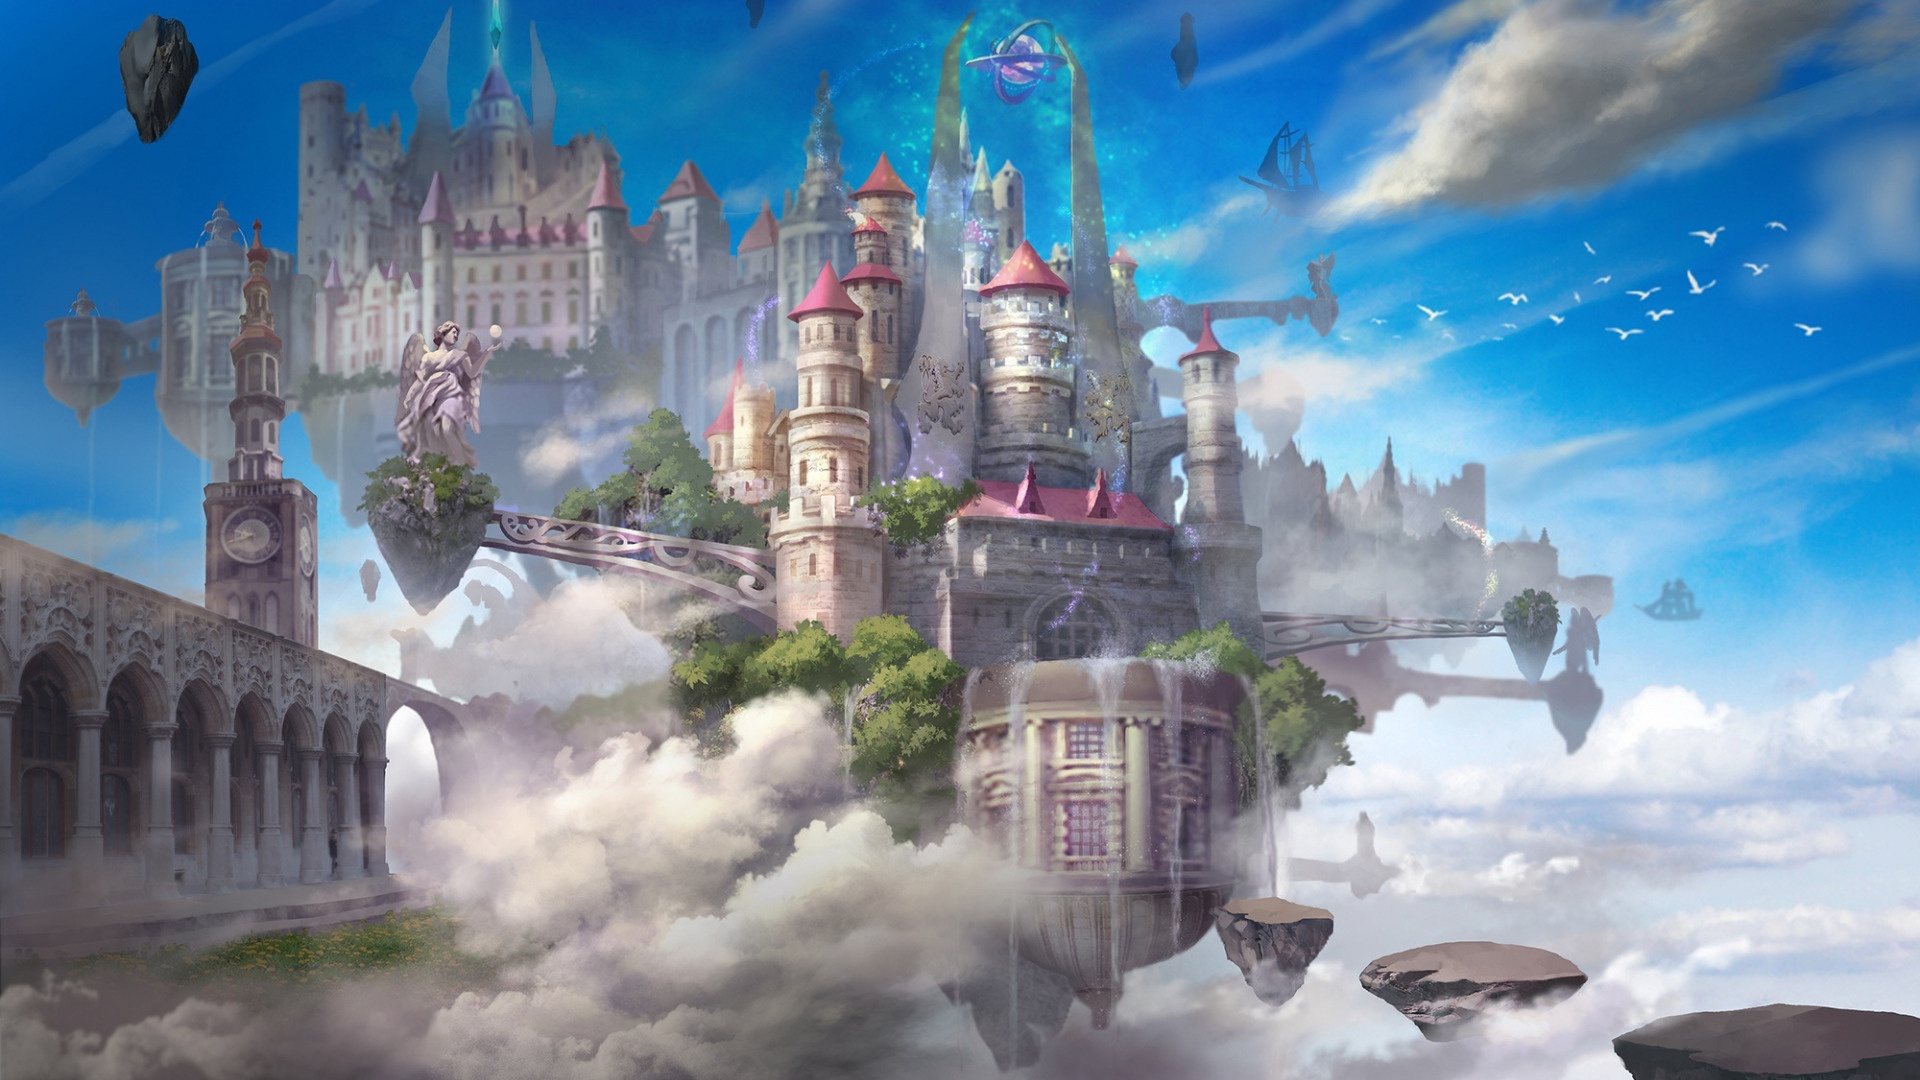 City In Clouds desktop background